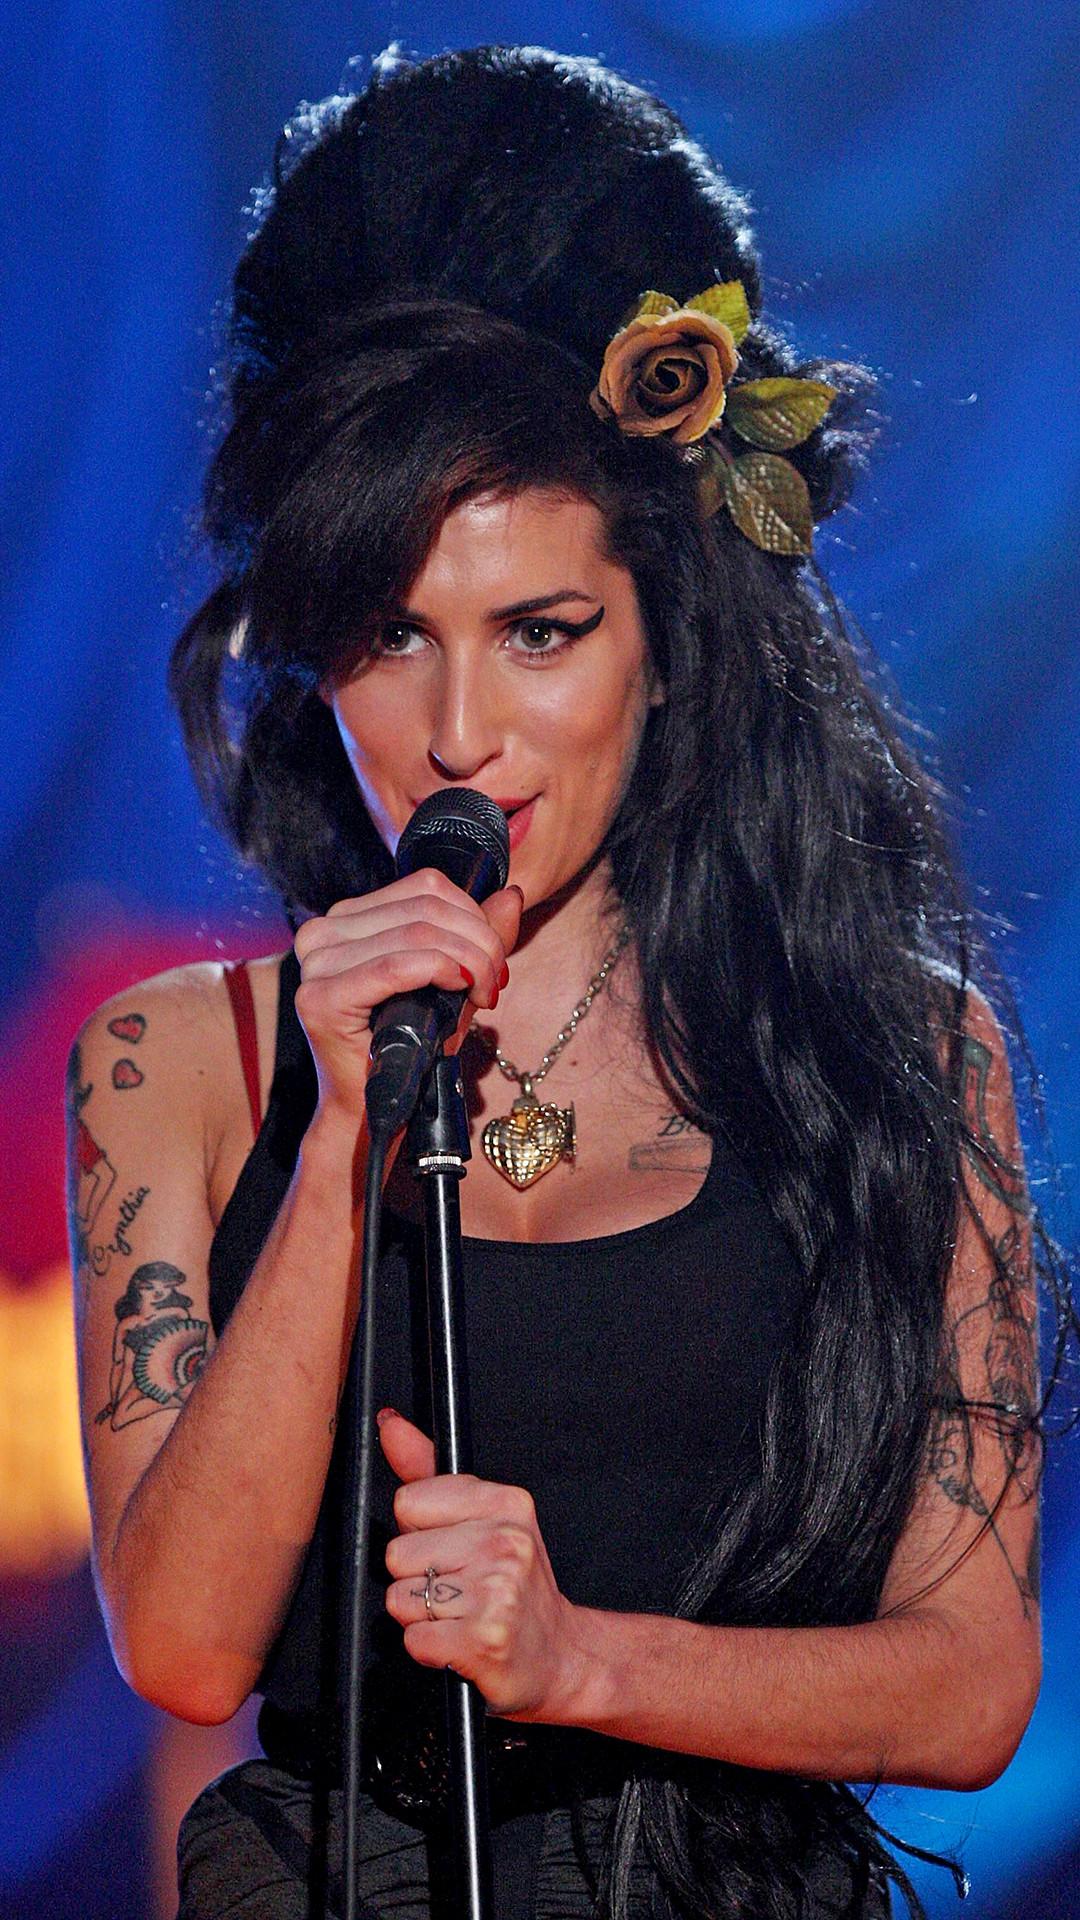 Amy Winehouse, 2008 Grammys Video